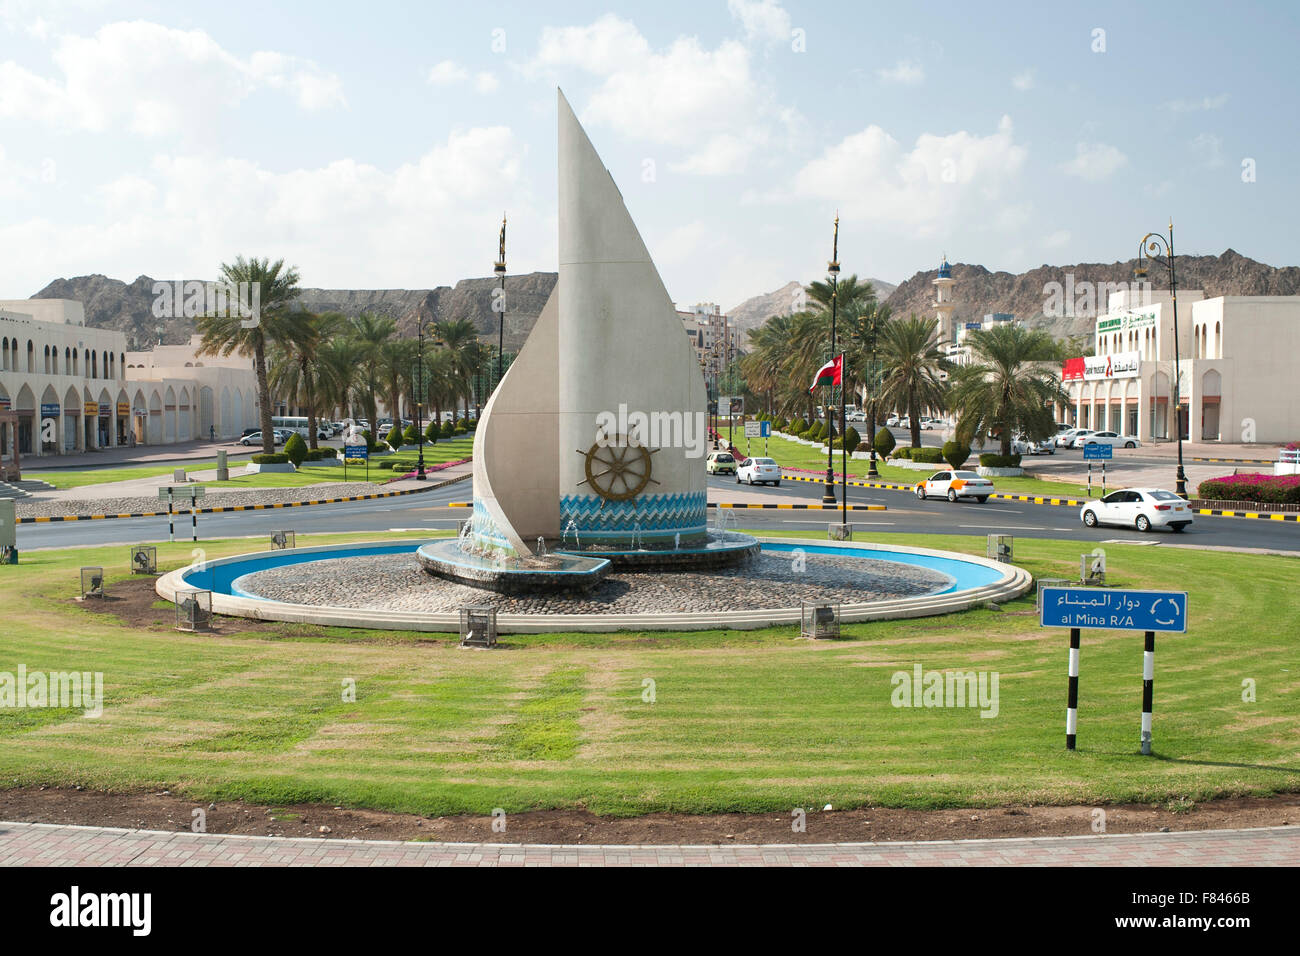 Al Mina Kreisverkehr / Kreisverkehr in Muscat, der Hauptstadt des Sultanats Oman. Stockbild